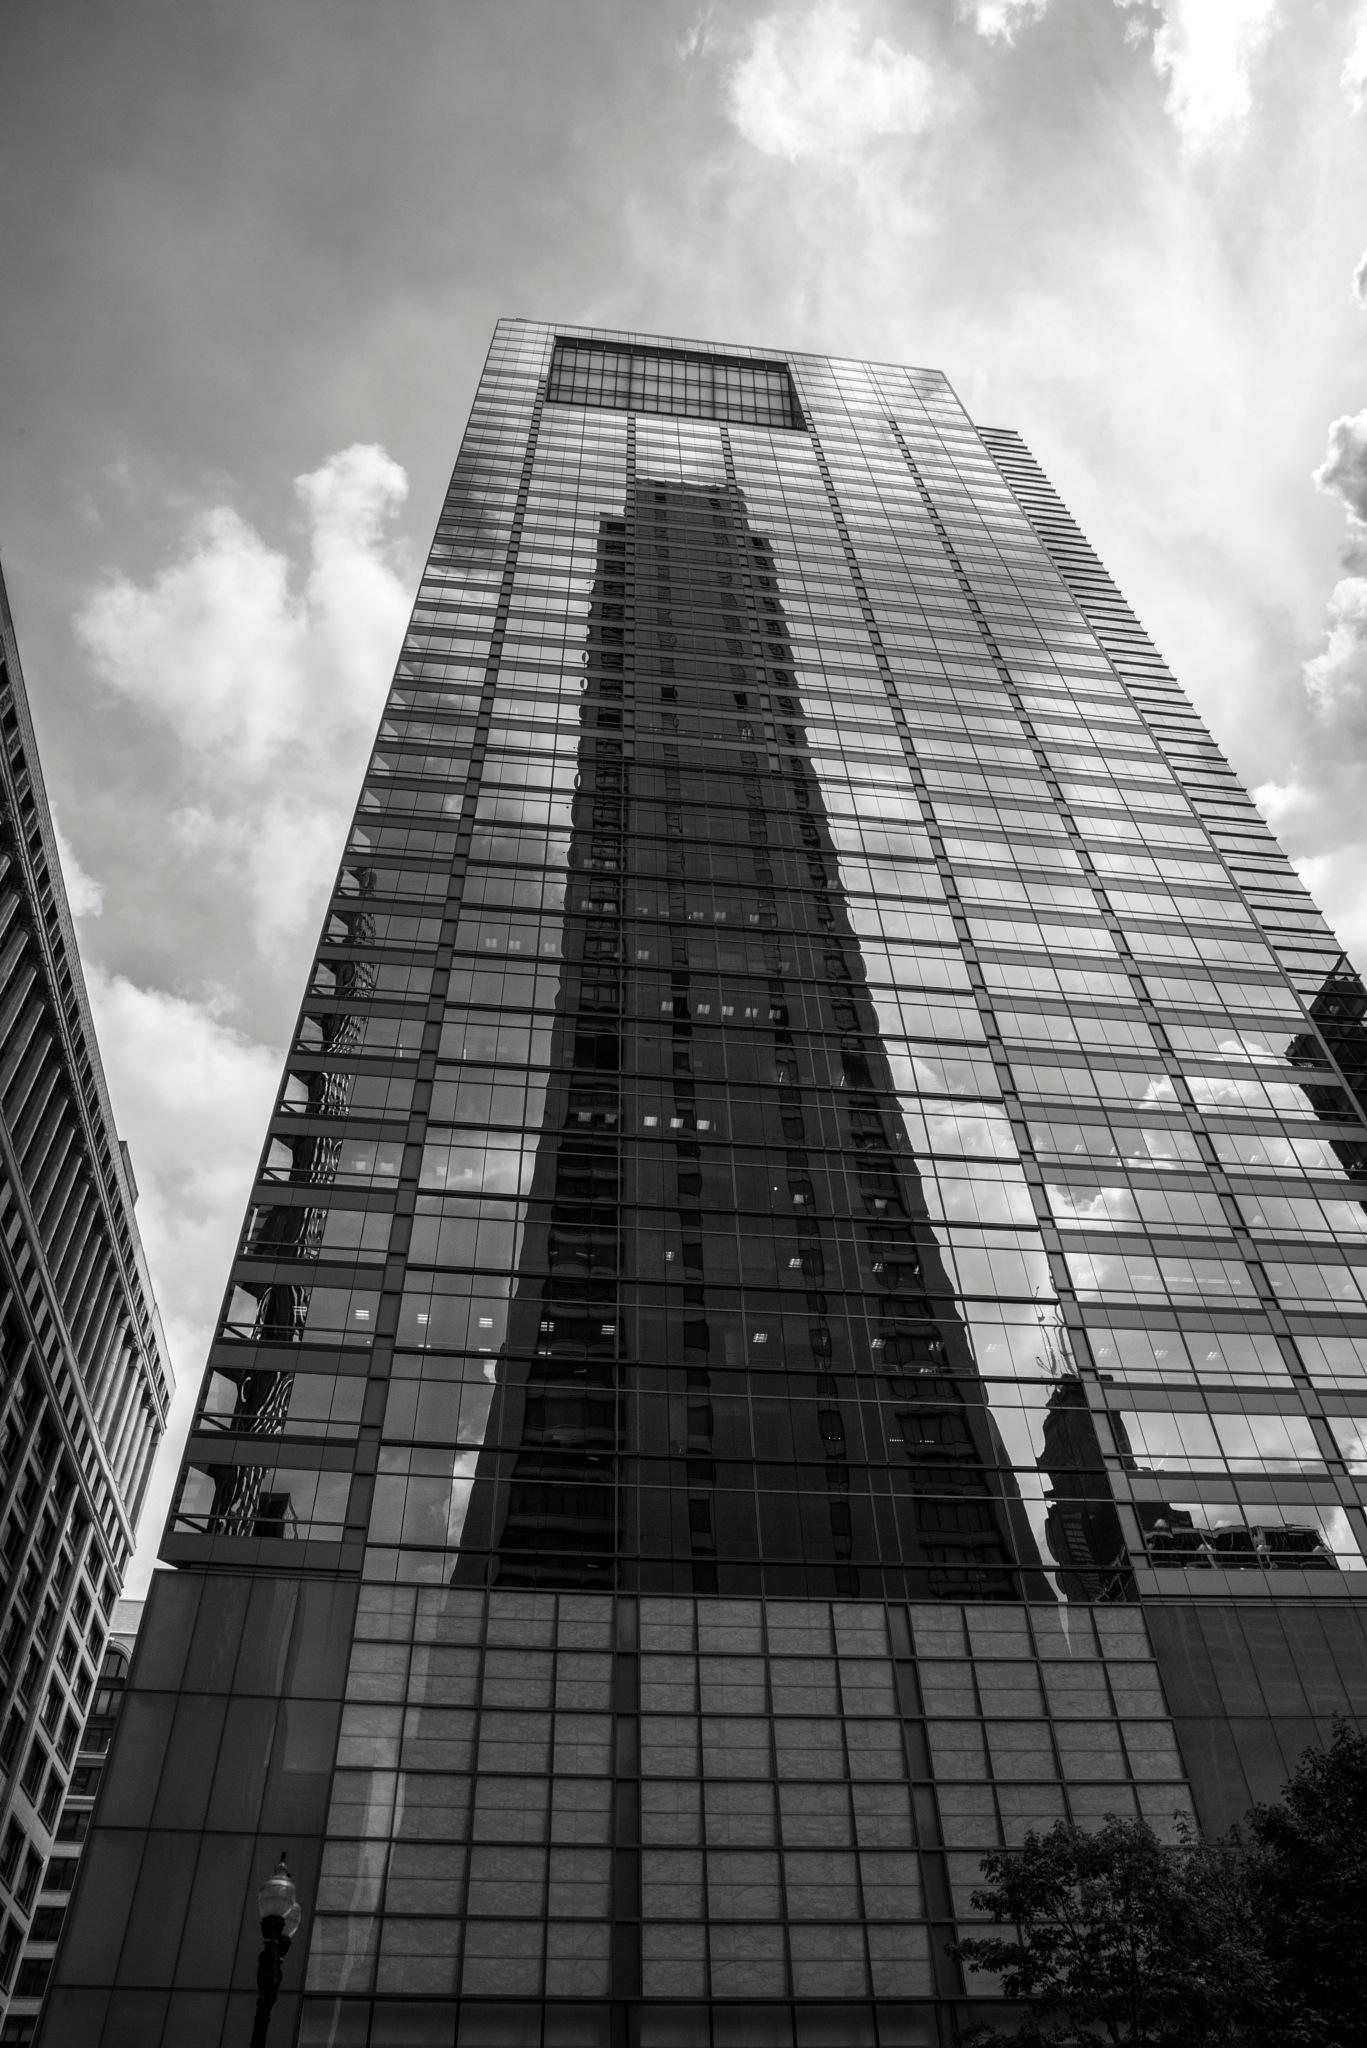 Chicago skyscraper by alextrusty